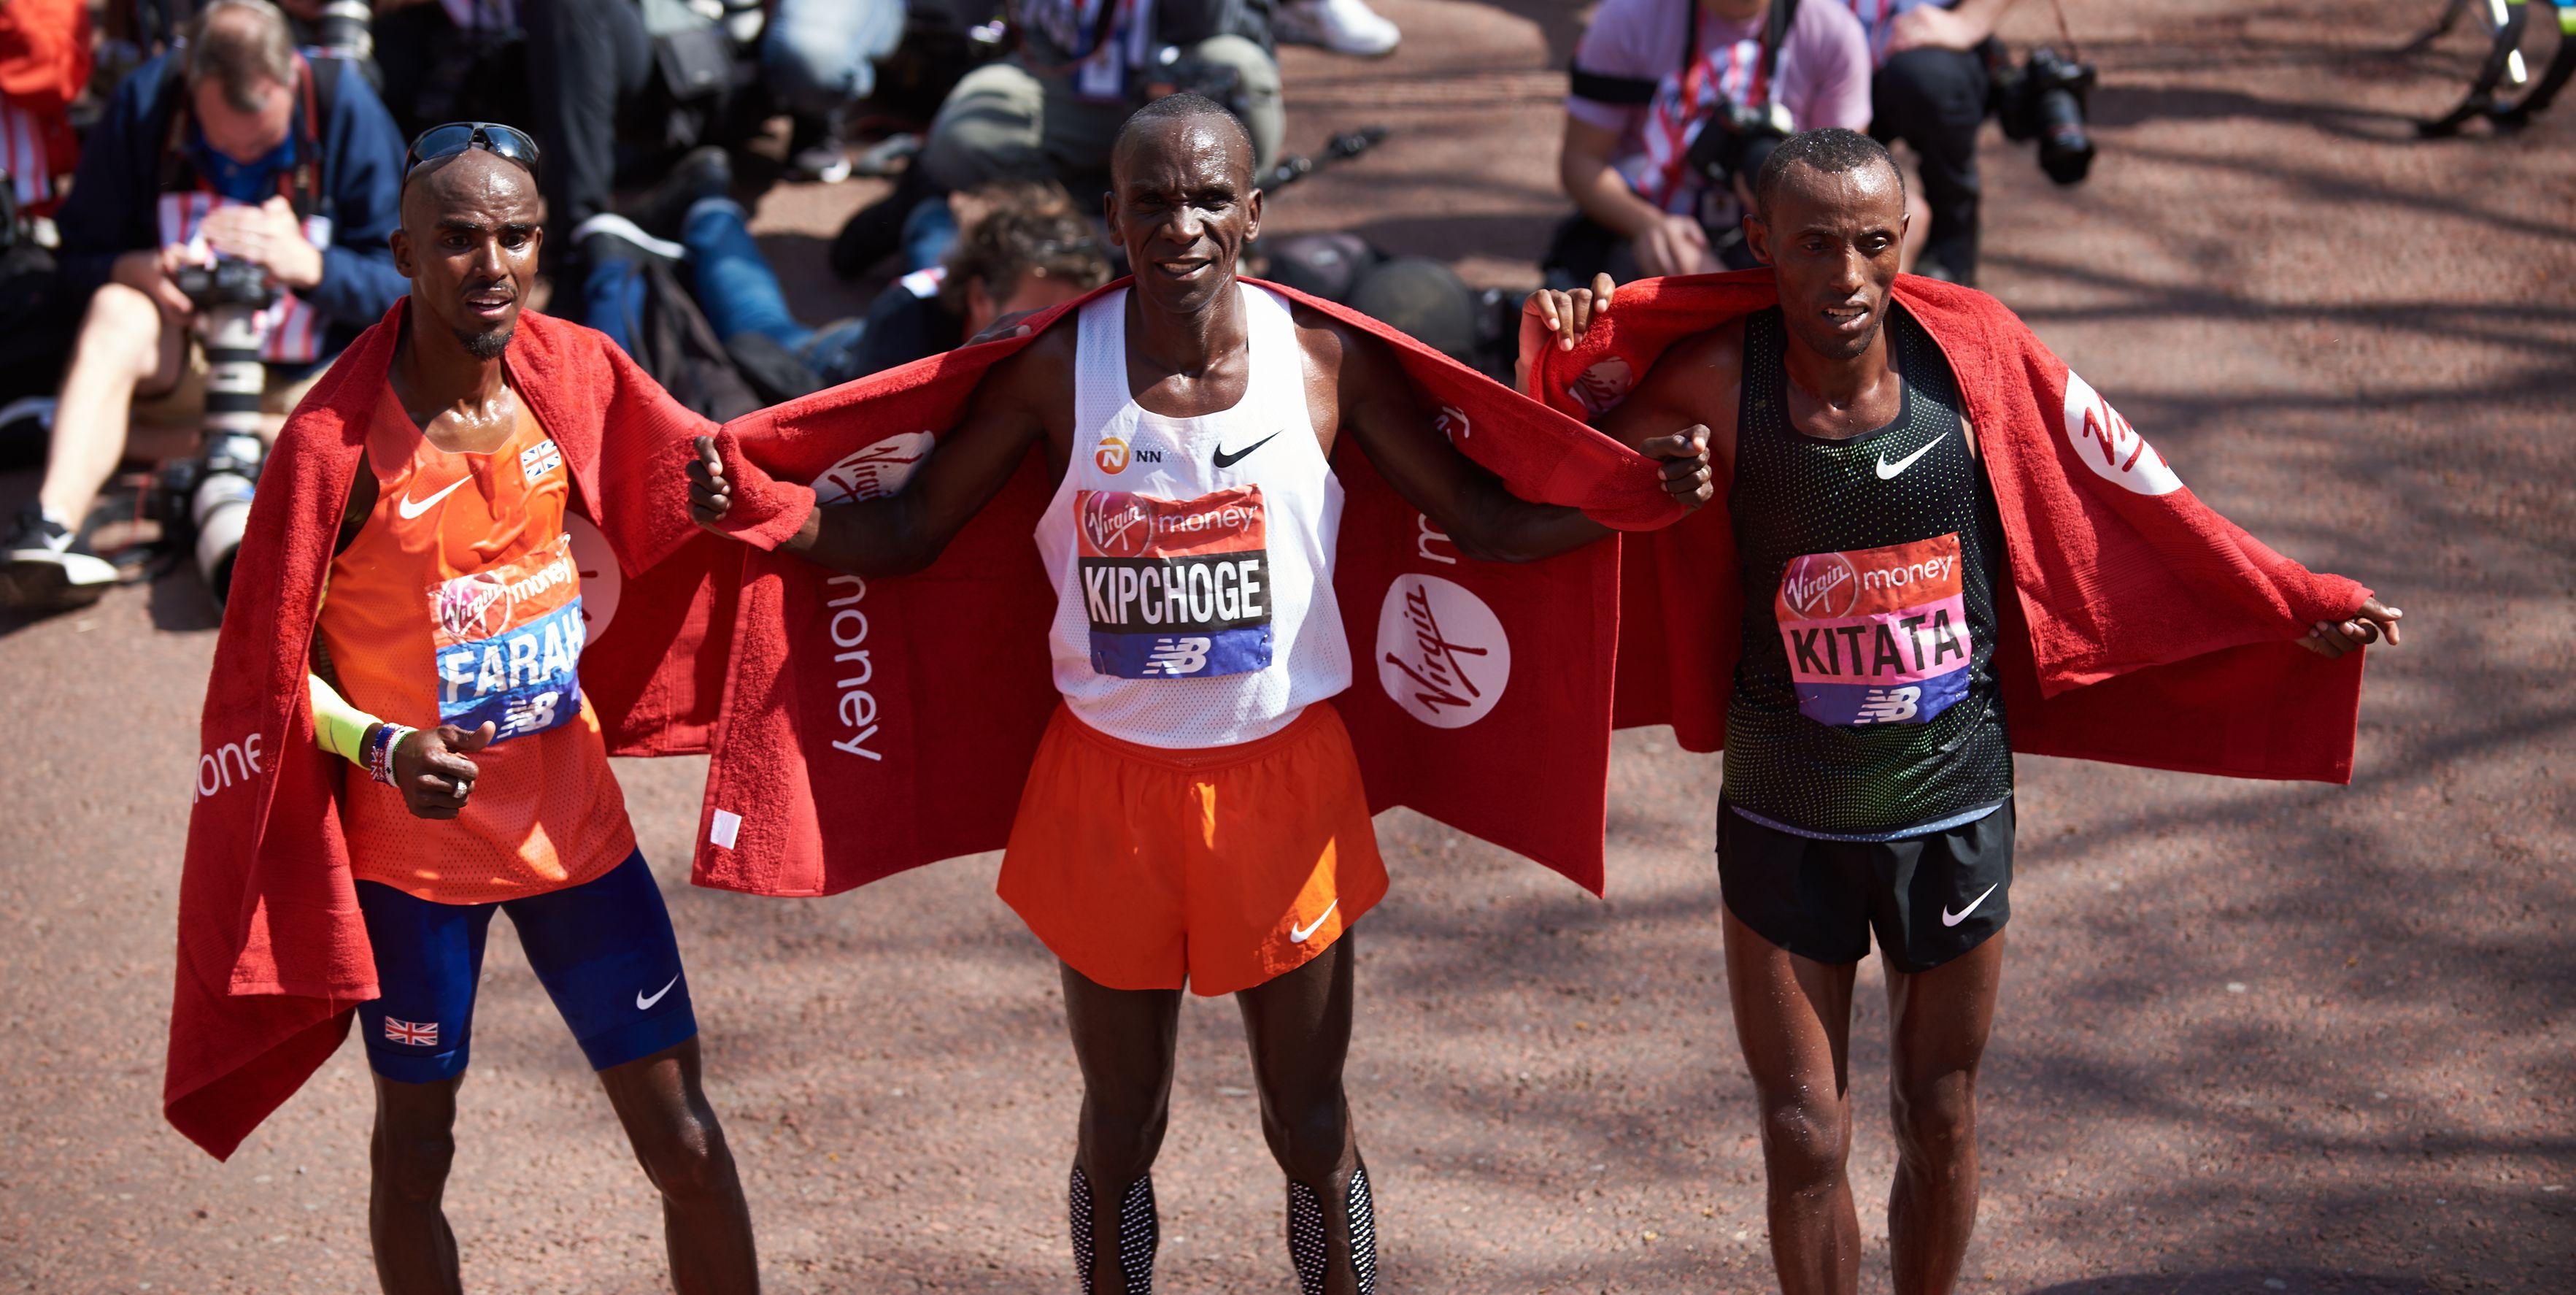 Abbott World Marathon Majors reveal new anti-doping initiative